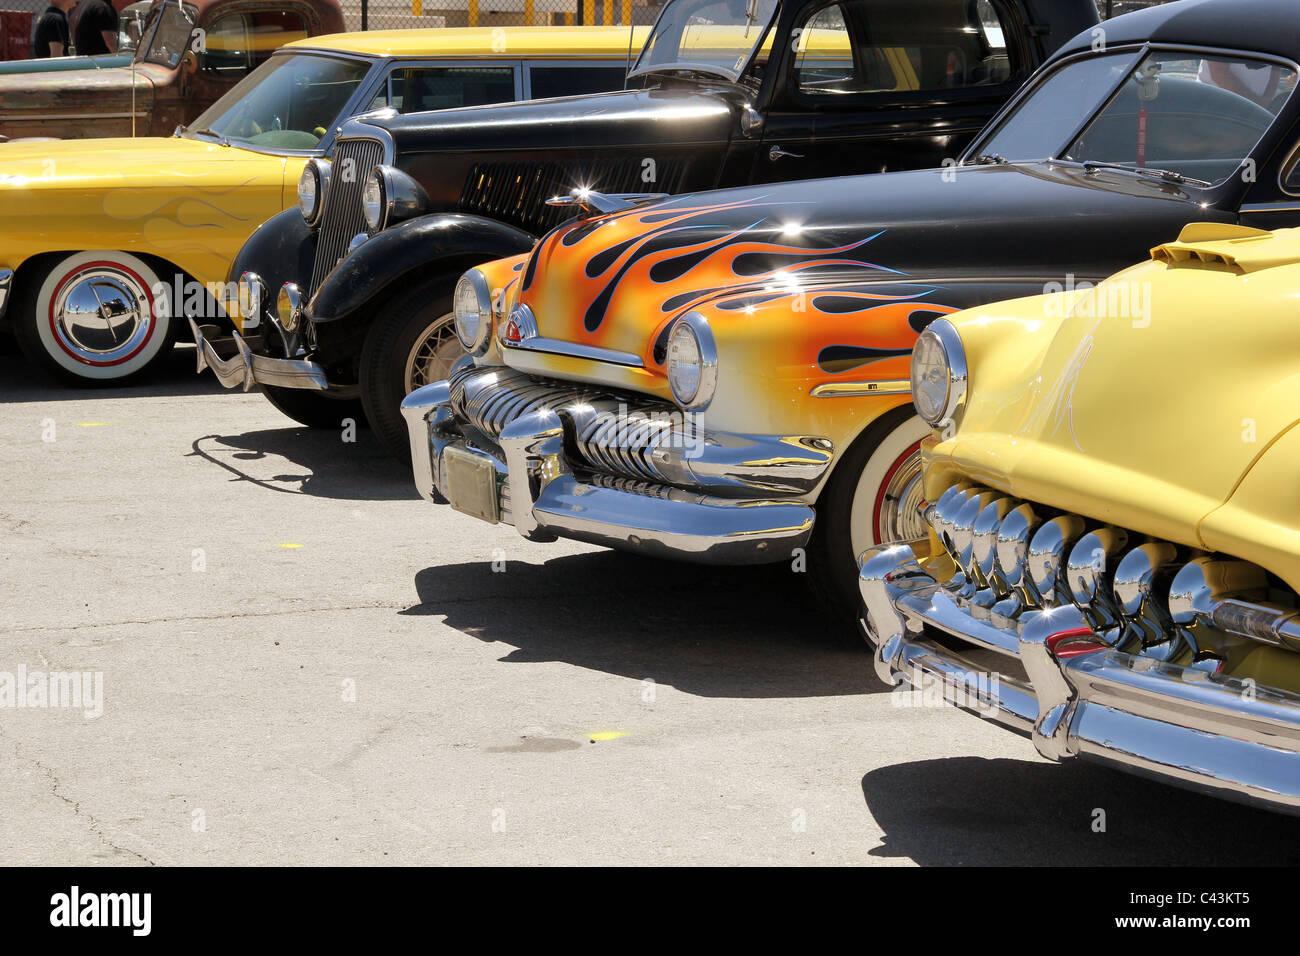 Hot rod cars - Stock Image